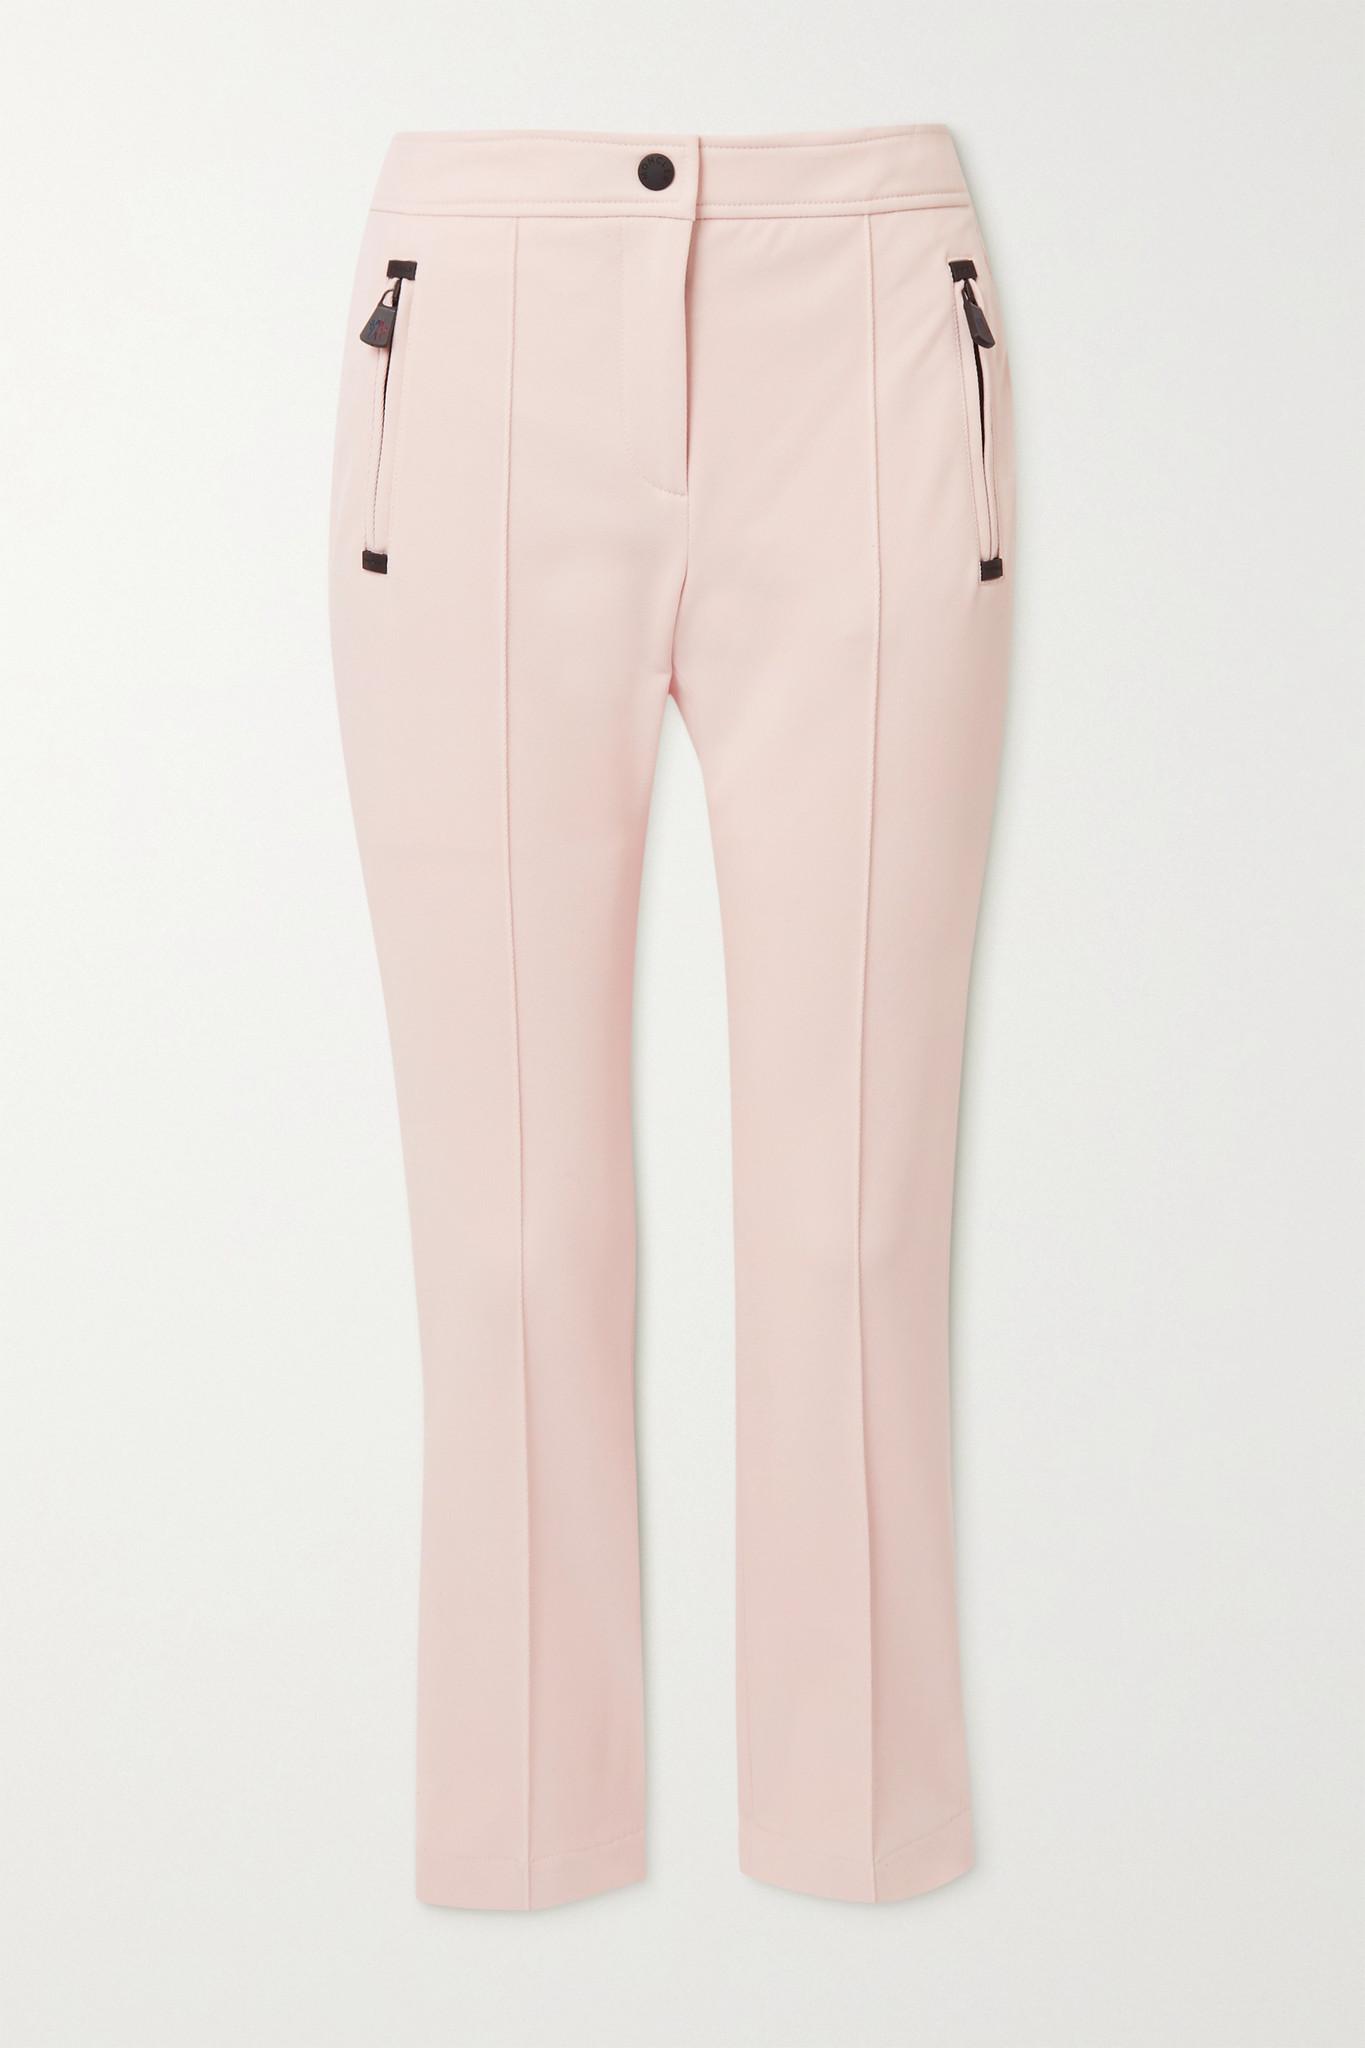 MONCLER GRENOBLE - Sportivo 弹力斜纹布窄腿滑雪裤 - 粉红色 - IT40